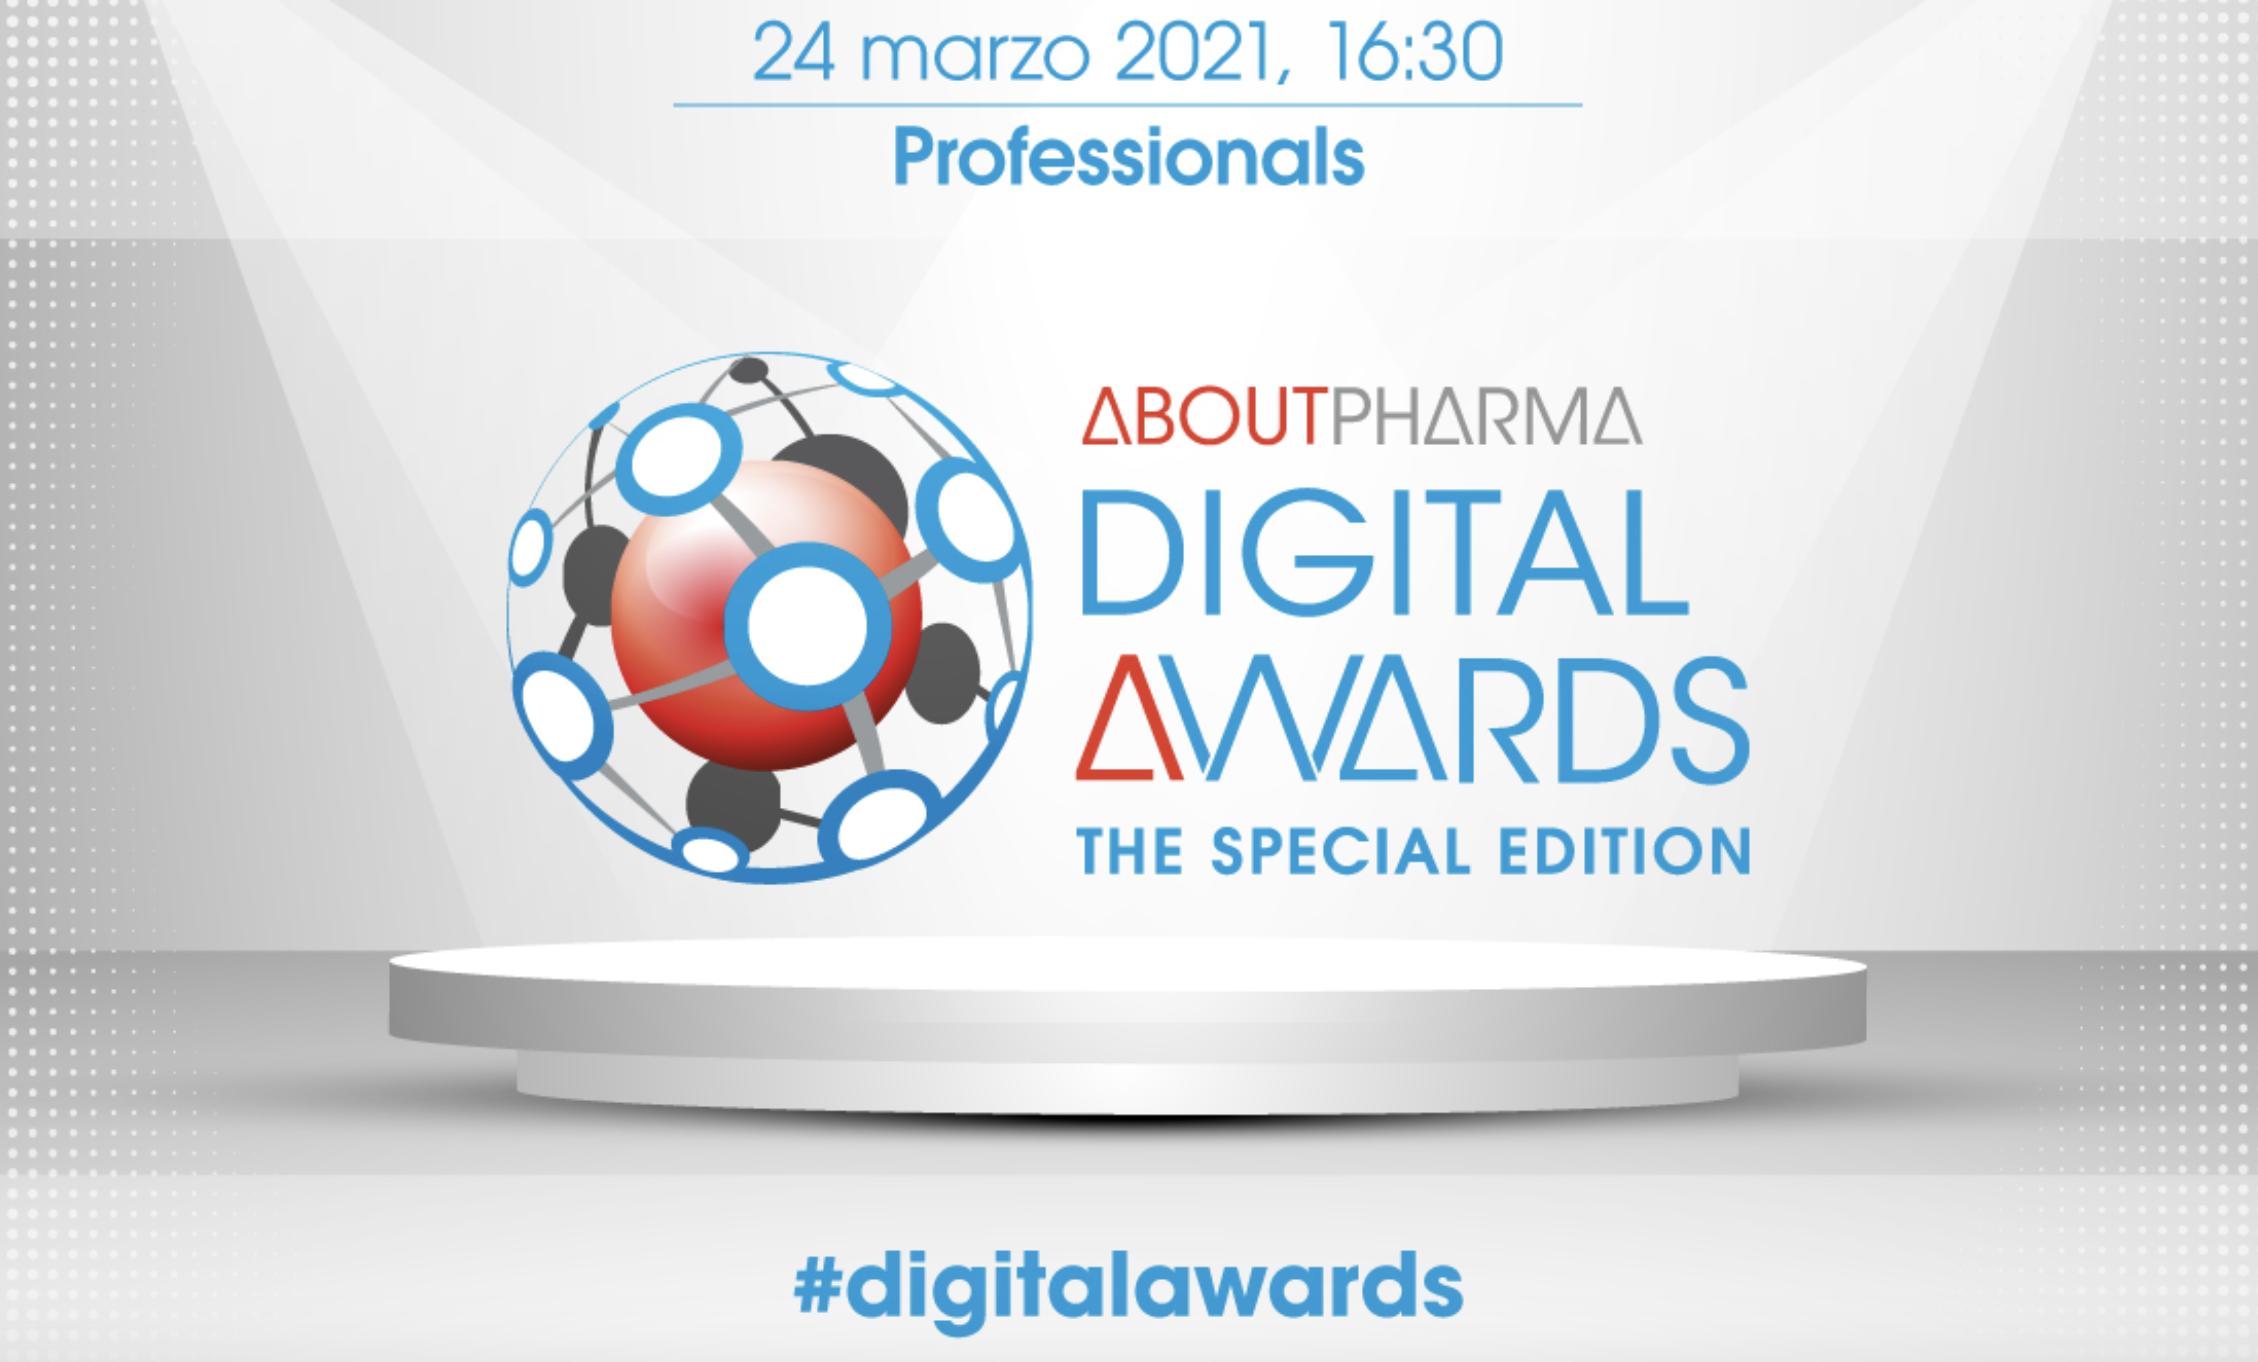 Digitalawards